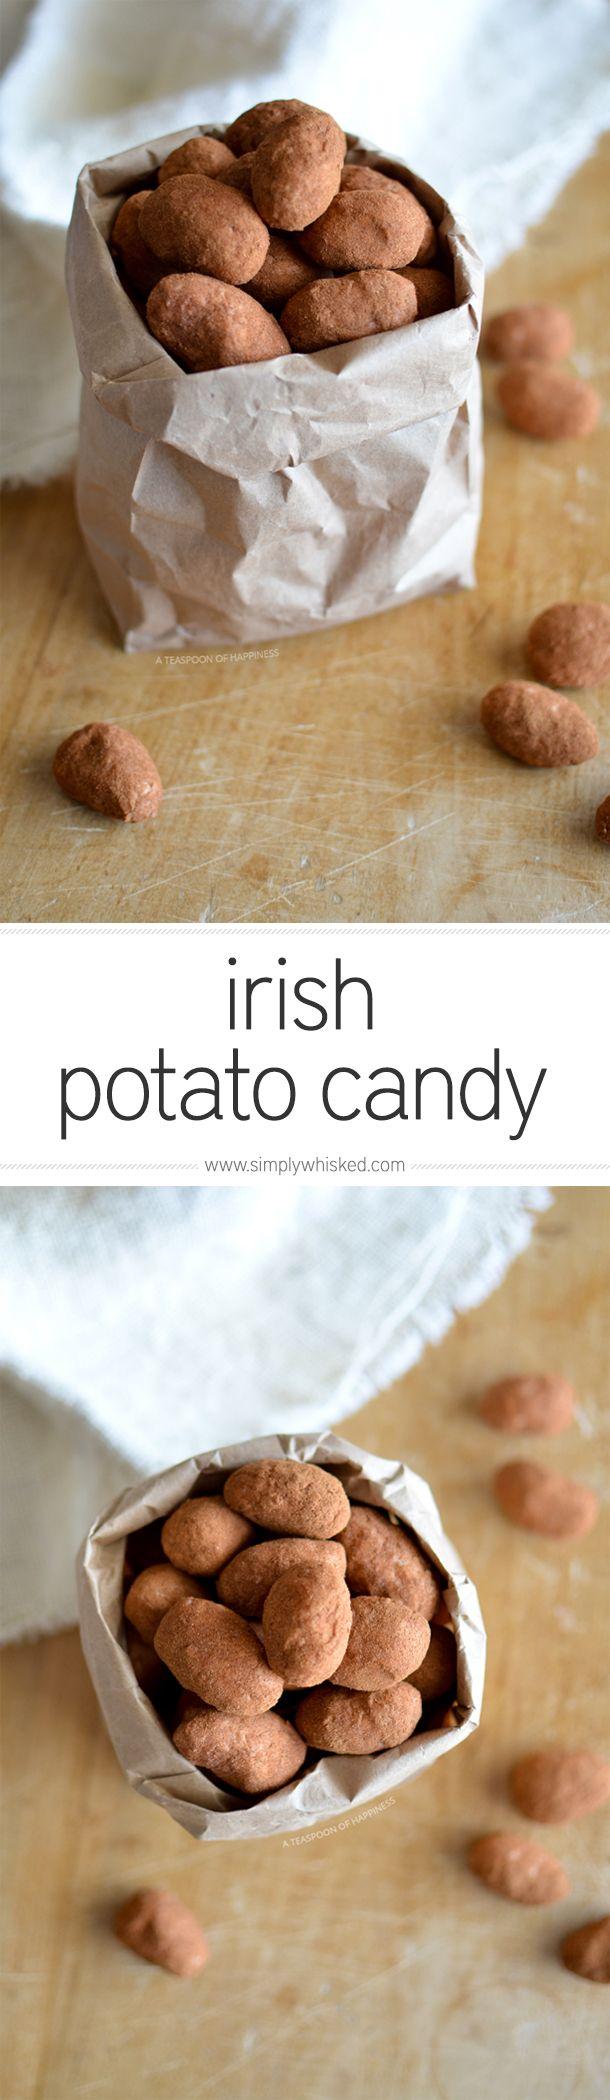 Irish potato candy | simplywhisked.com